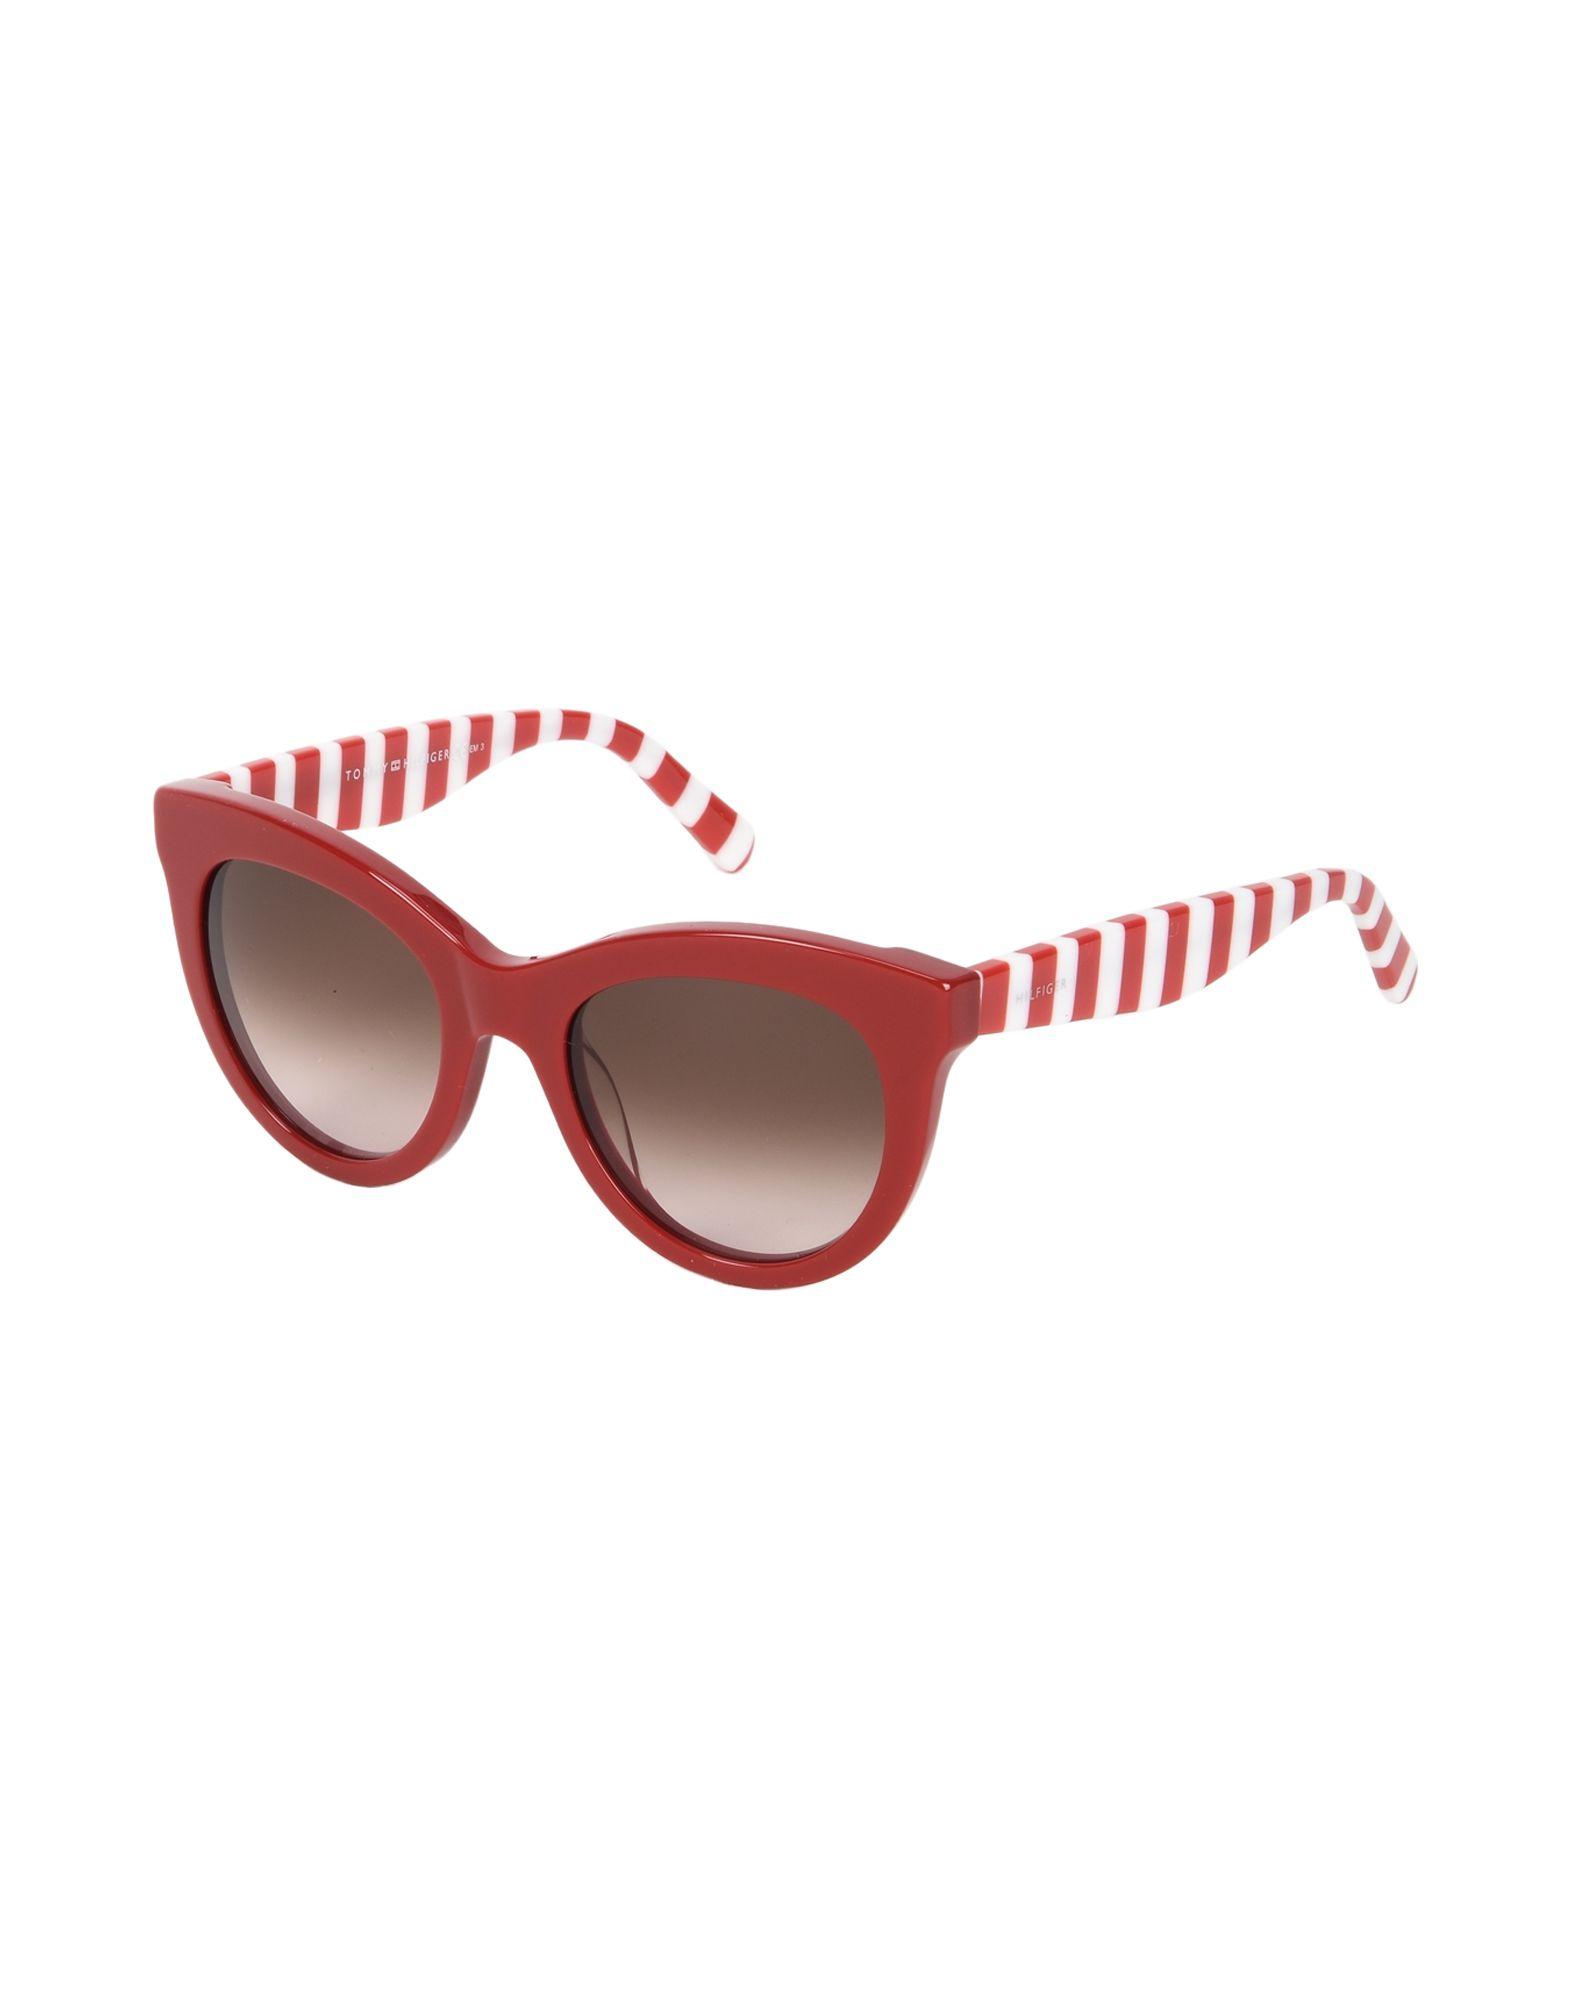 TOMMY HILFIGER Солнечные очки tommy hilfiger часы tommy hilfiger 1781311 коллекция ainsley